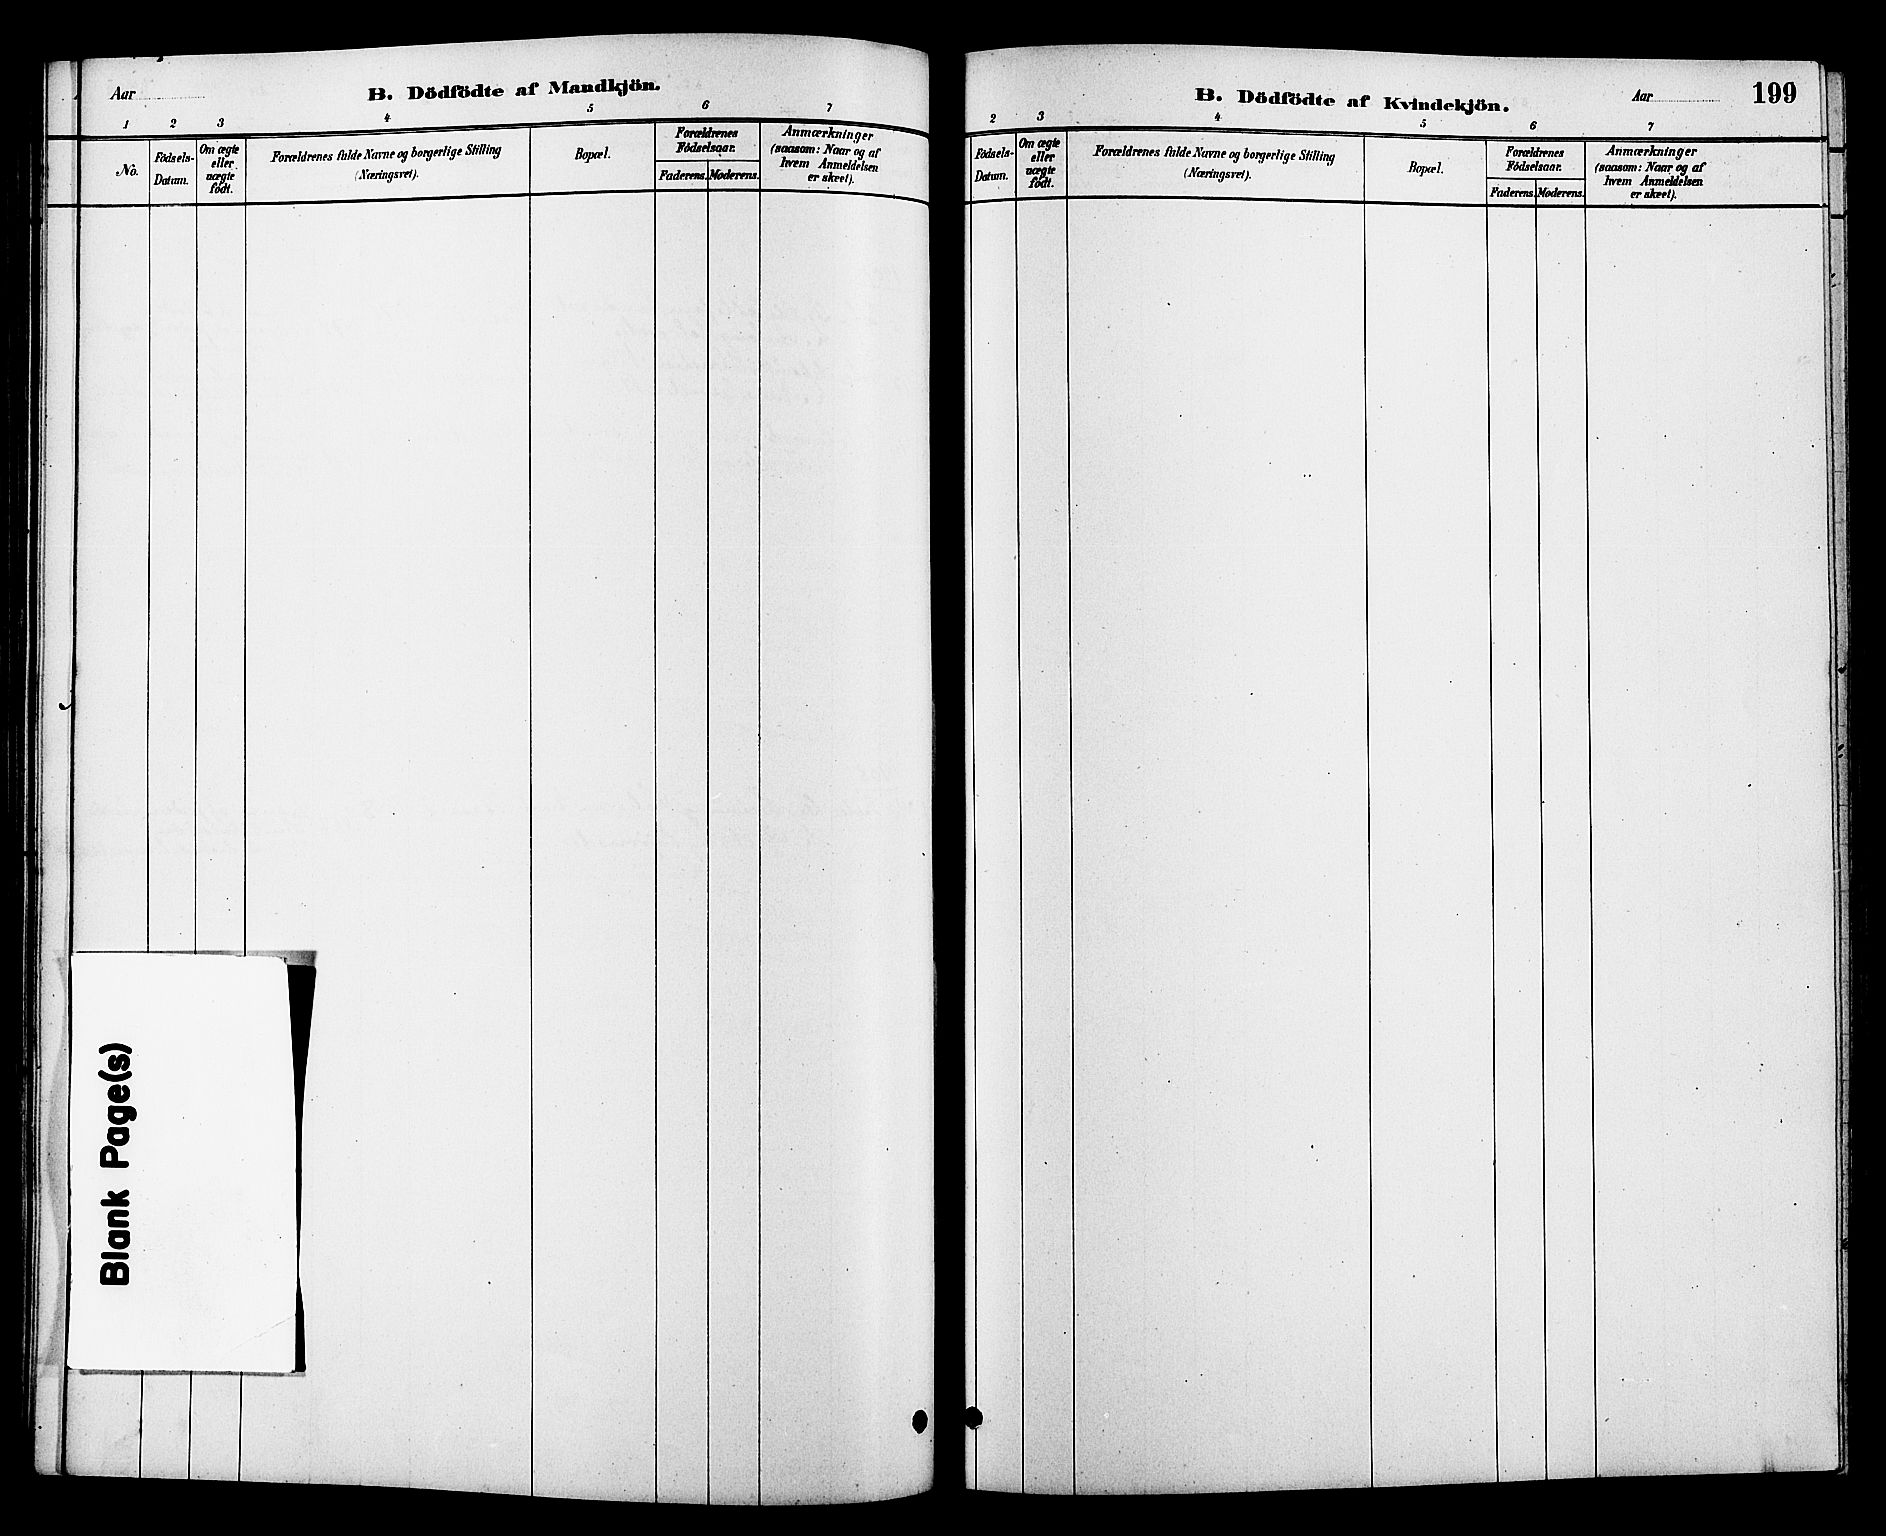 SAKO, Heddal kirkebøker, G/Ga/L0002: Klokkerbok nr. I 2, 1879-1908, s. 199